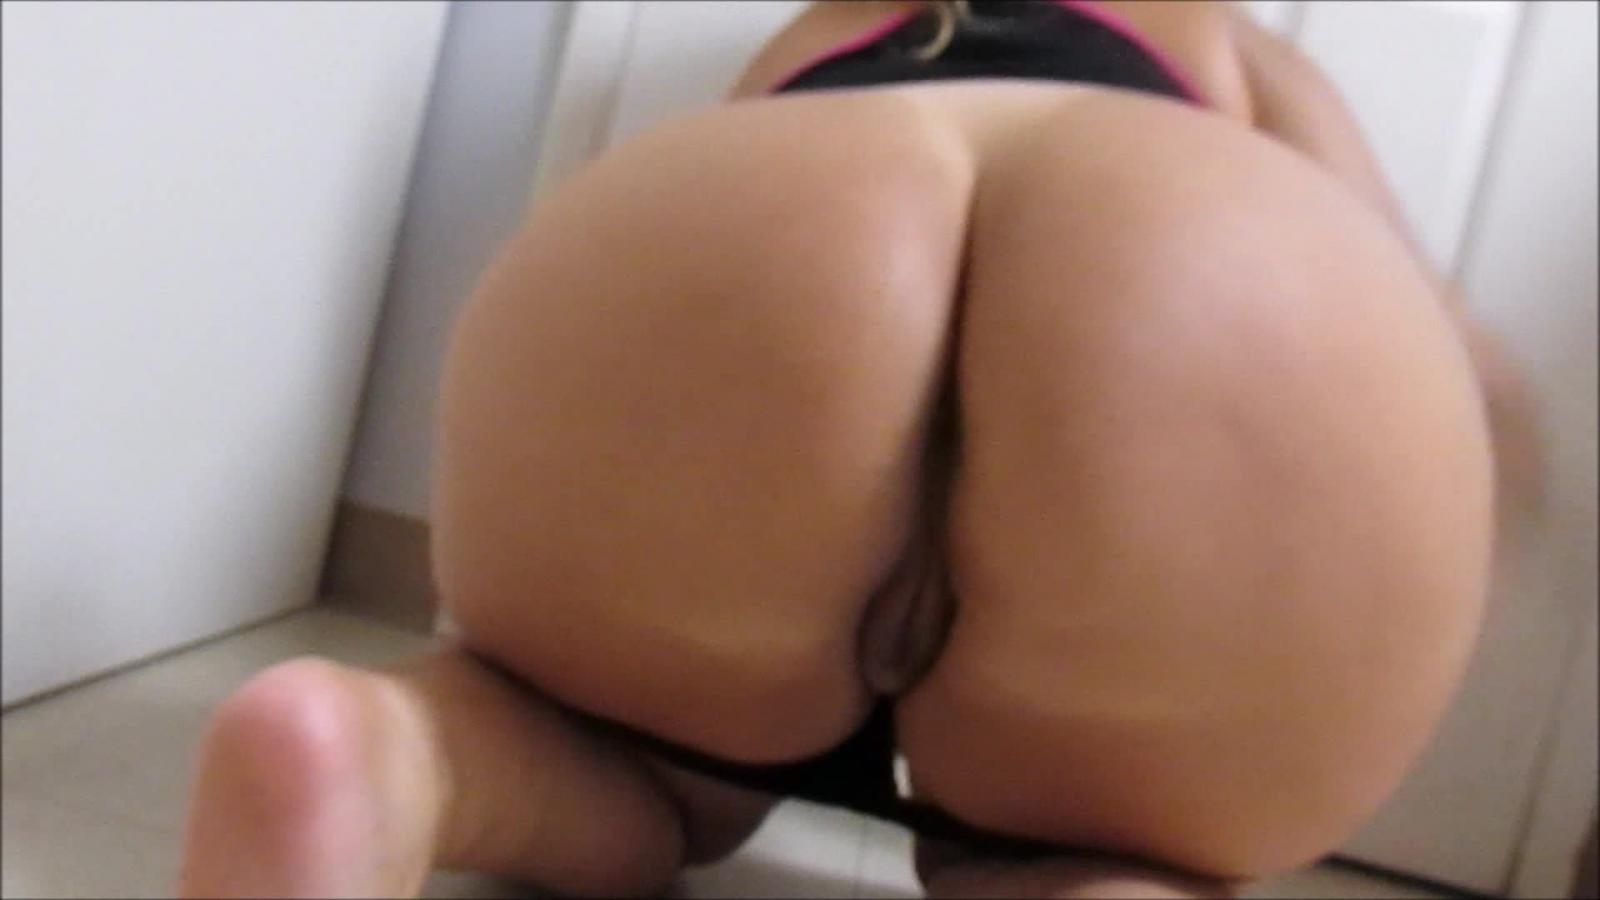 Kaylee butt shaking videos, asian mayonnaise shrimp